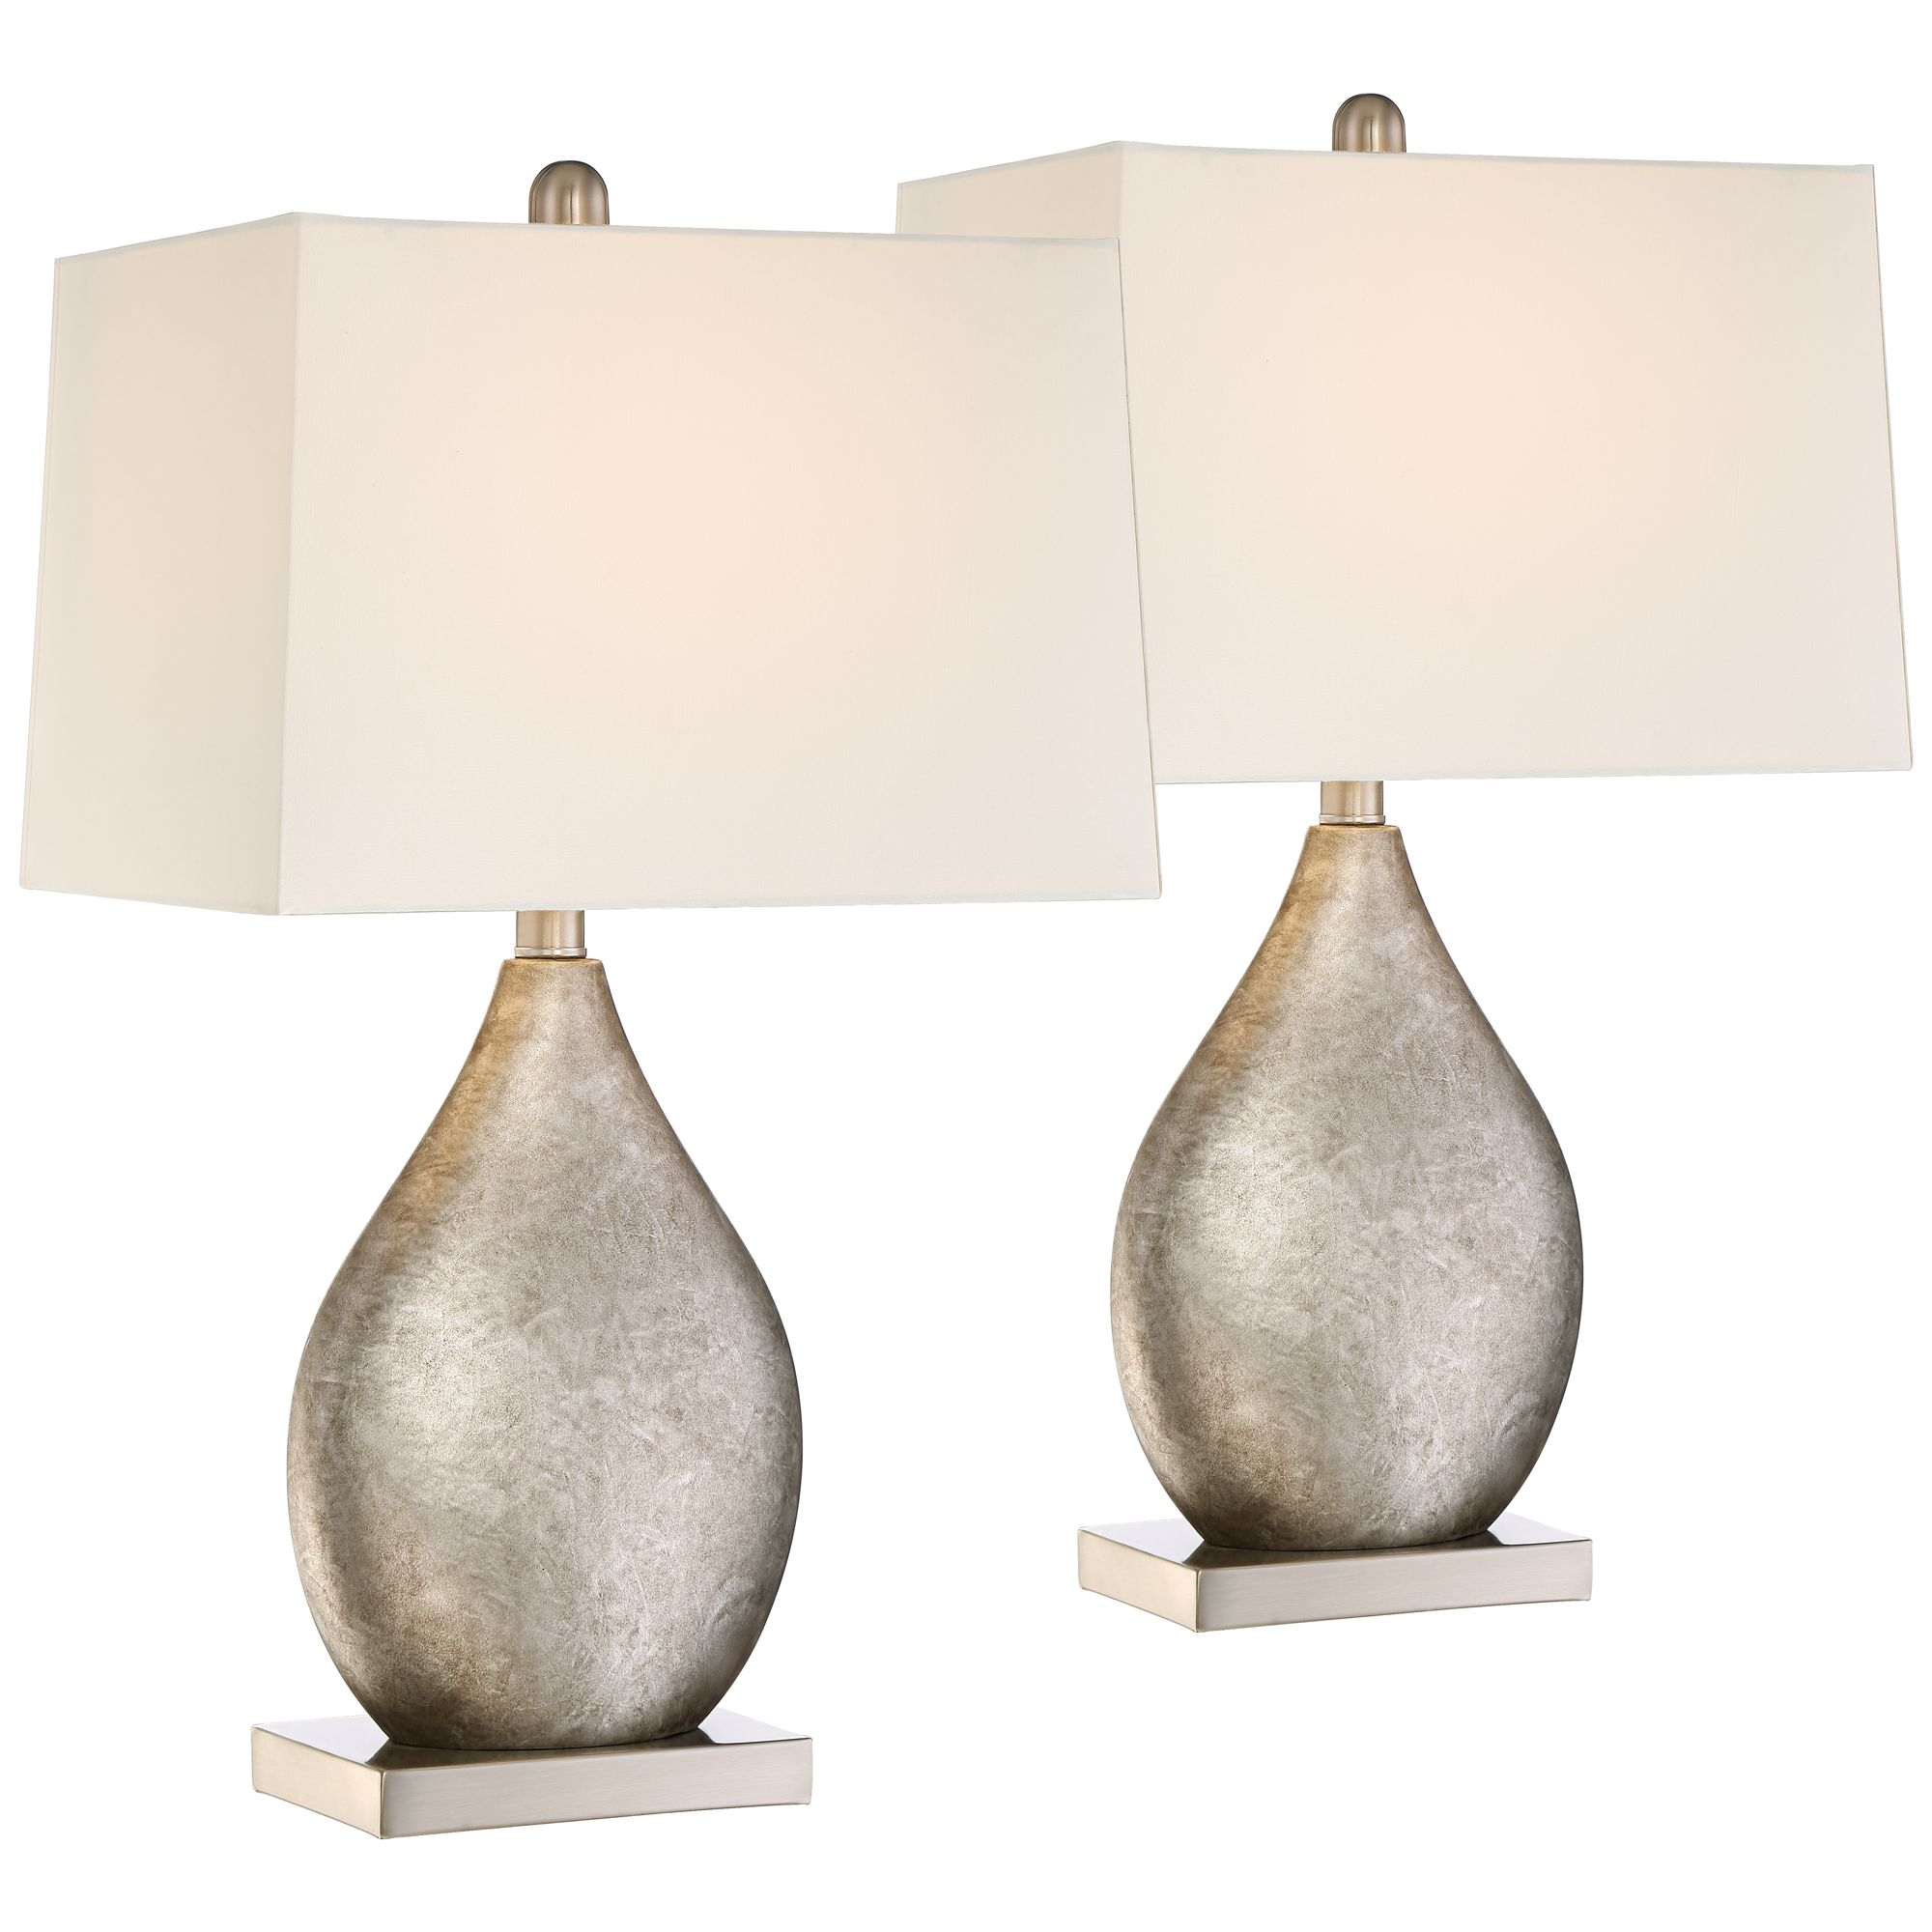 360 Lighting Modern Table Lamps Set of 2 Silver Metal Teardrop Off White Rectangular Shade for Living Room Family Bedroom Bedside